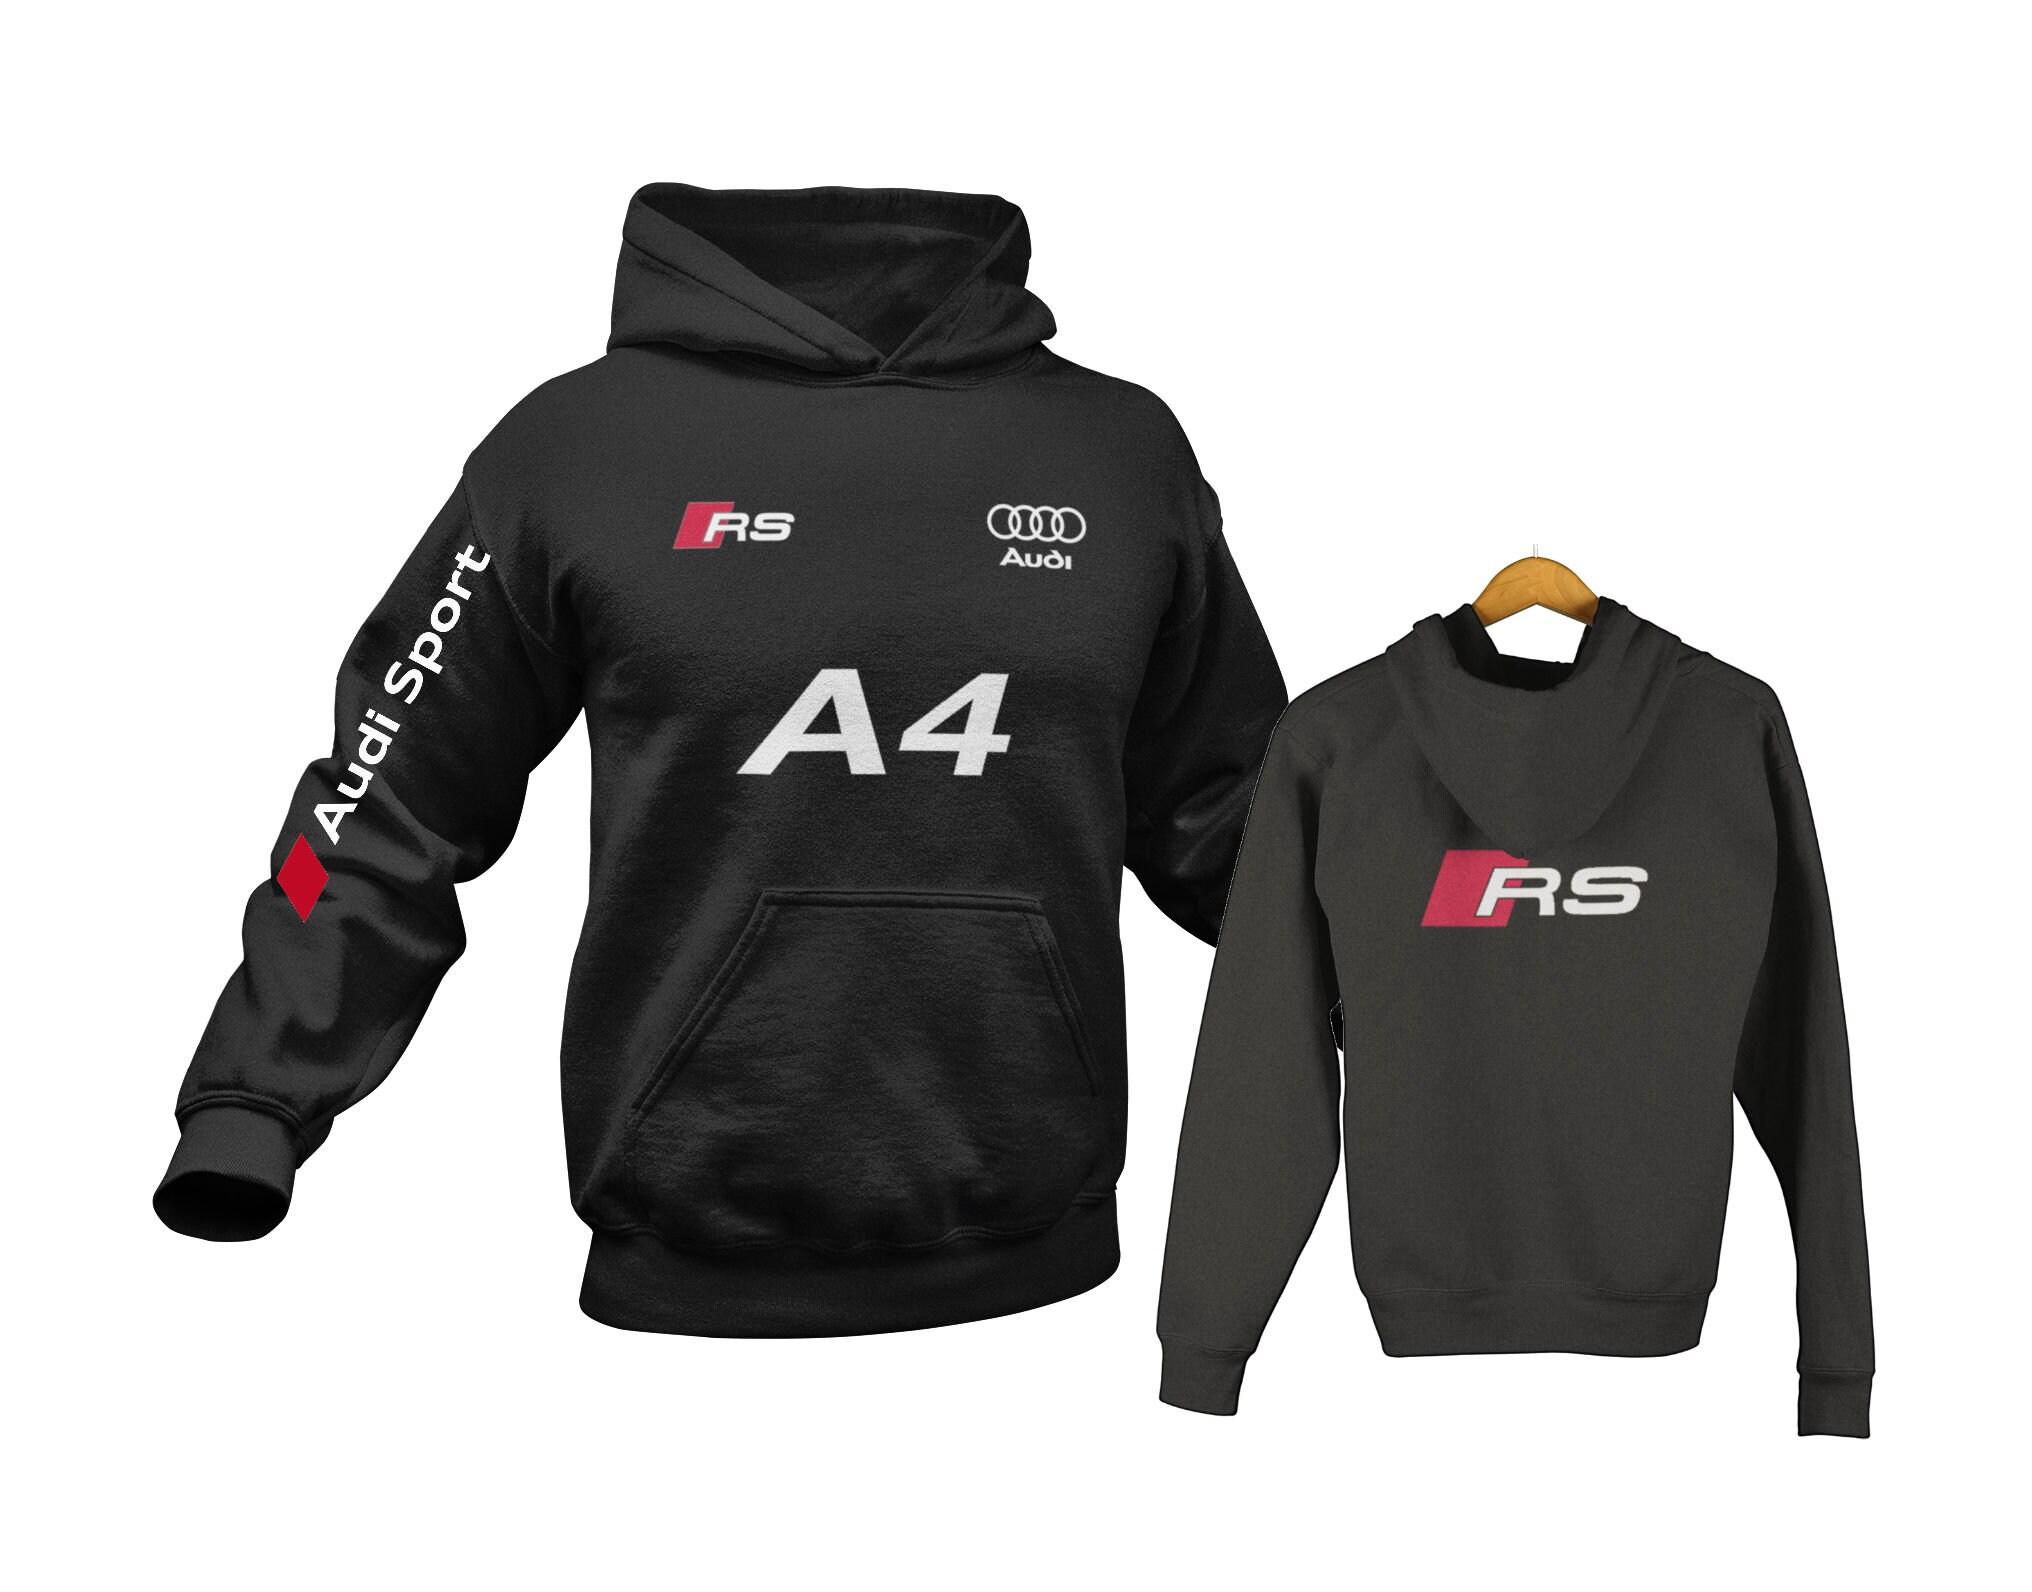 Audi A4  RS  A4  Sweat-shirt à capuche 31acfb